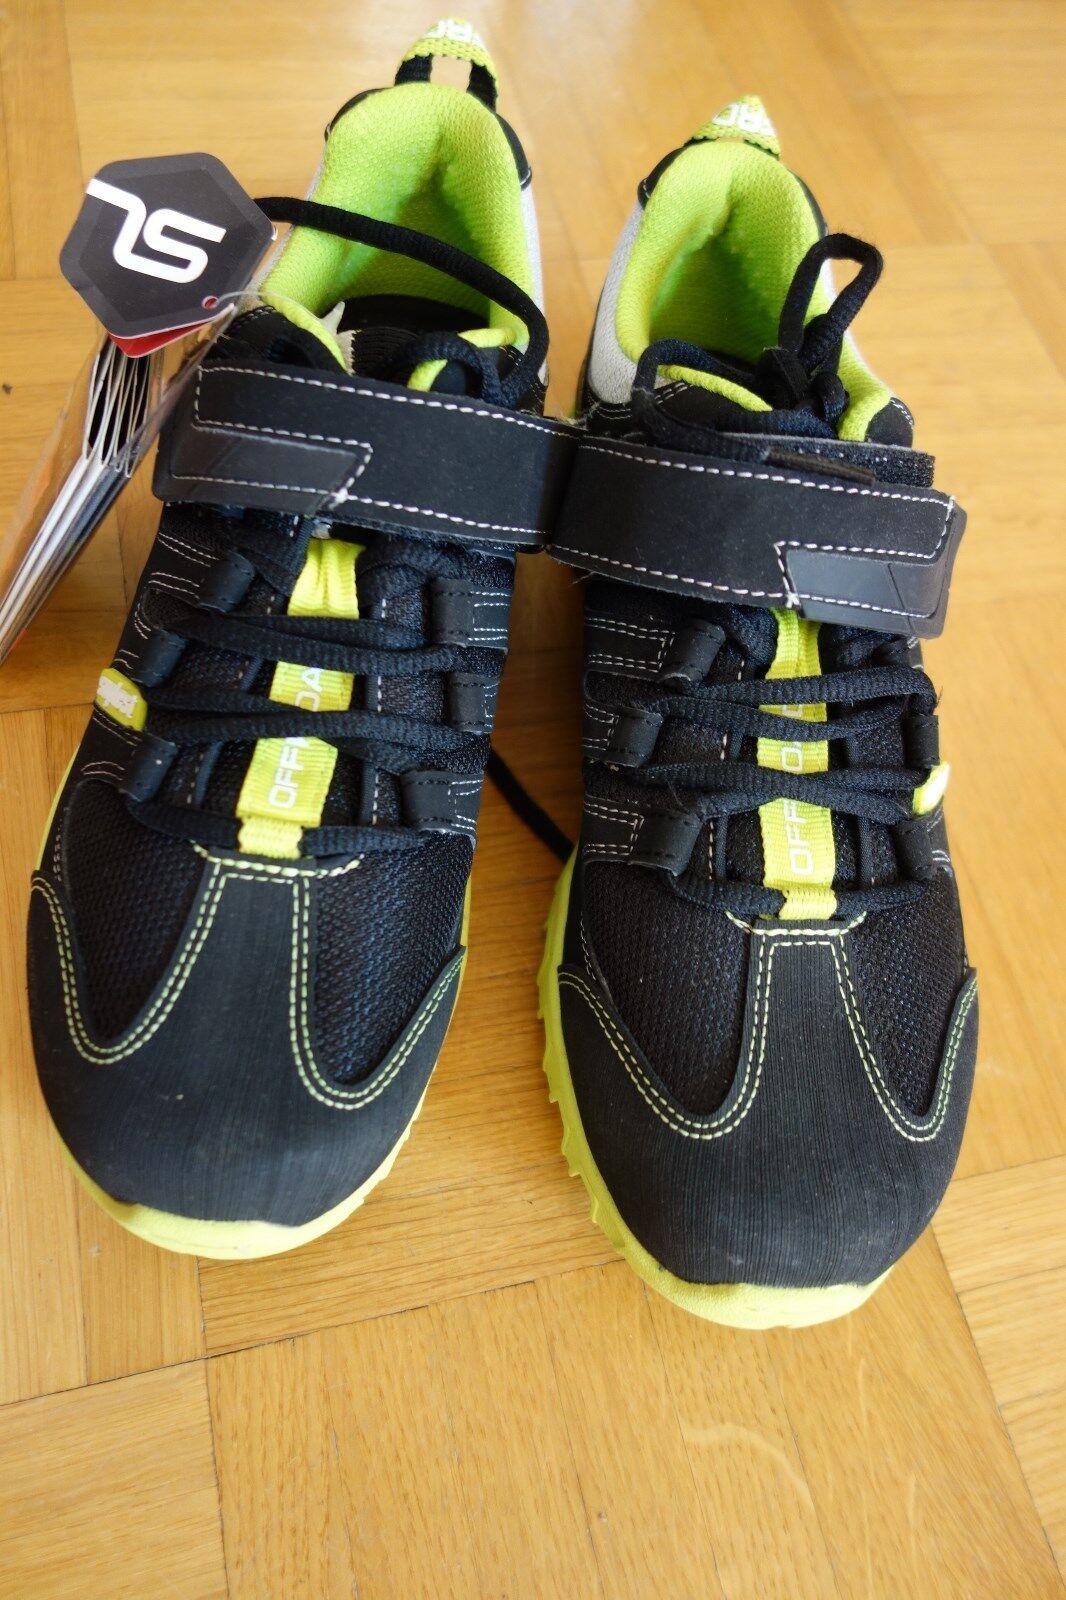 Suplest Fuoristrada Lacing shoes  Bici di Montagna, Größe 37 o 40  cheap